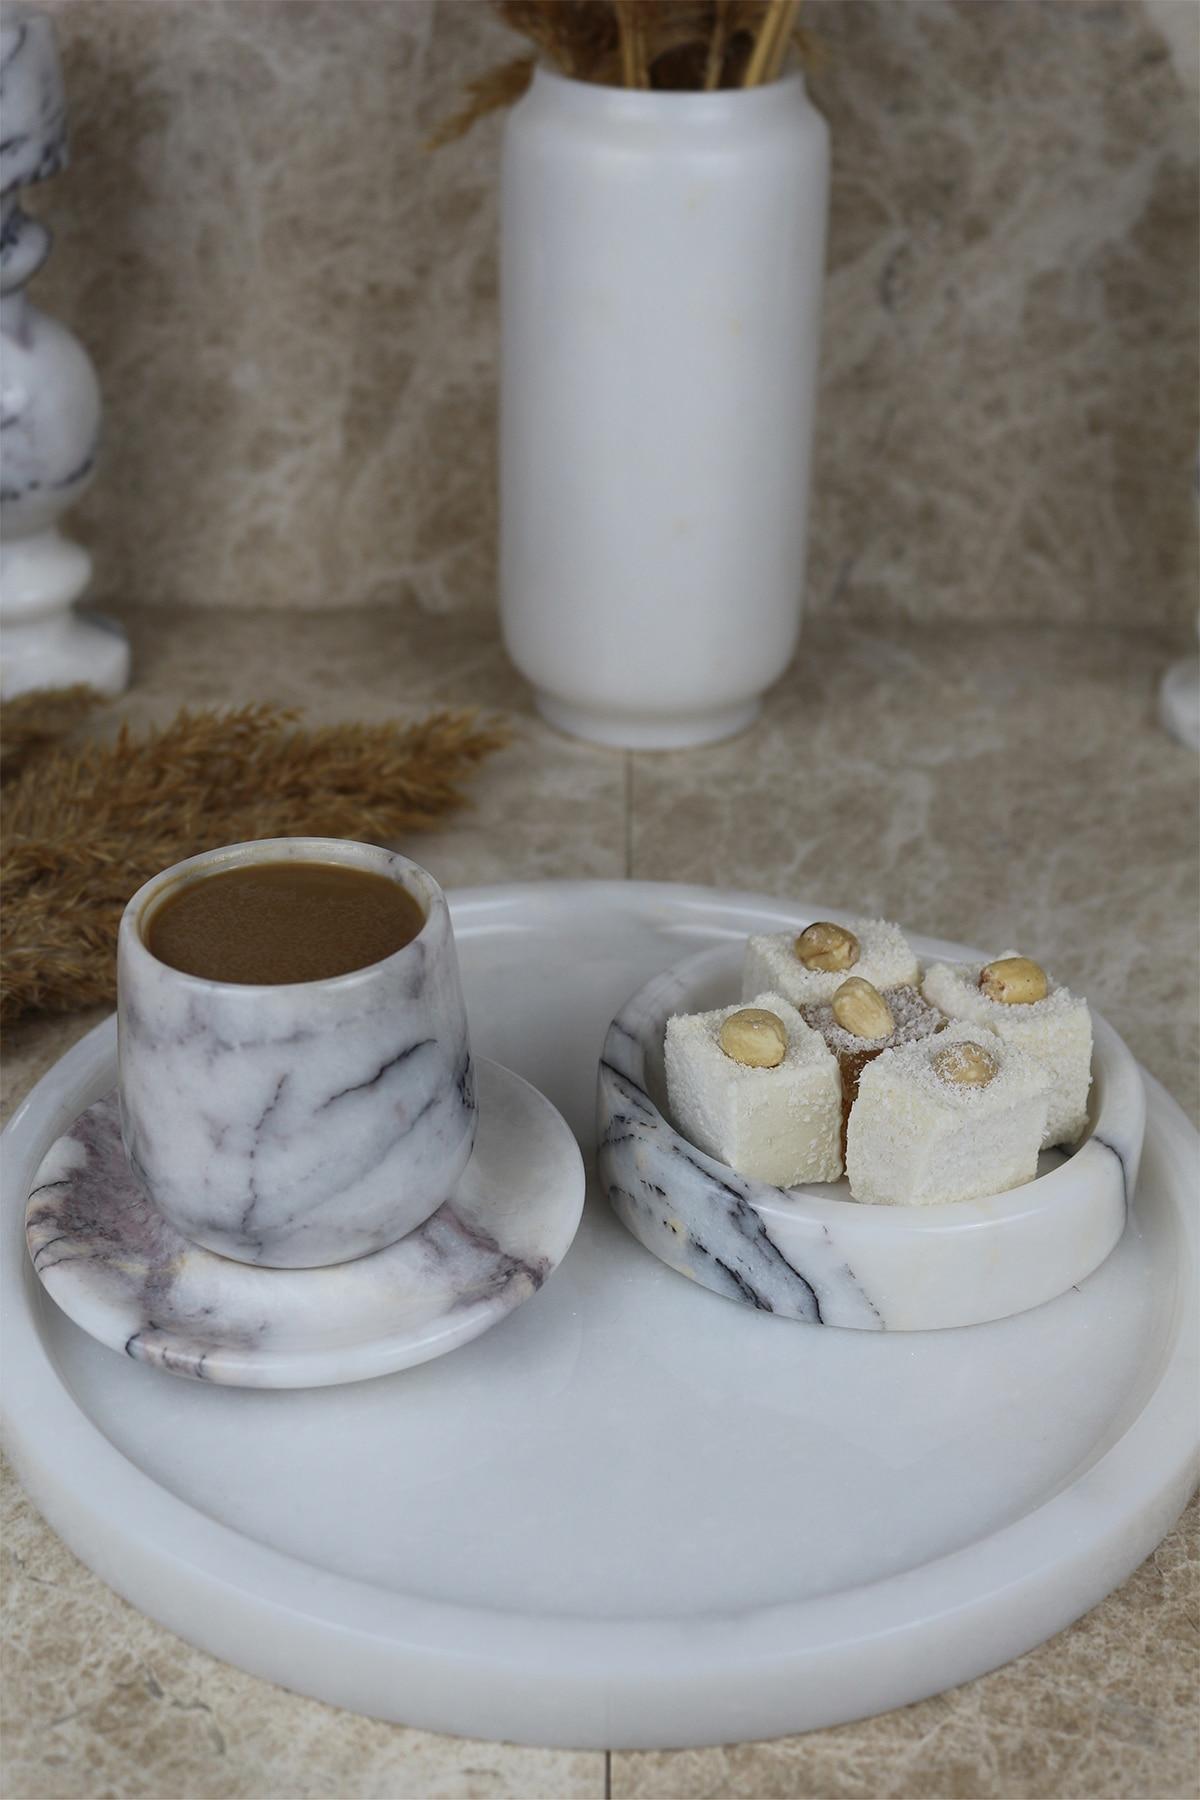 Nordic 25cm white real natural marble tray bathroom storage round jewelry box kitchen dish dispenser luxury Tiss